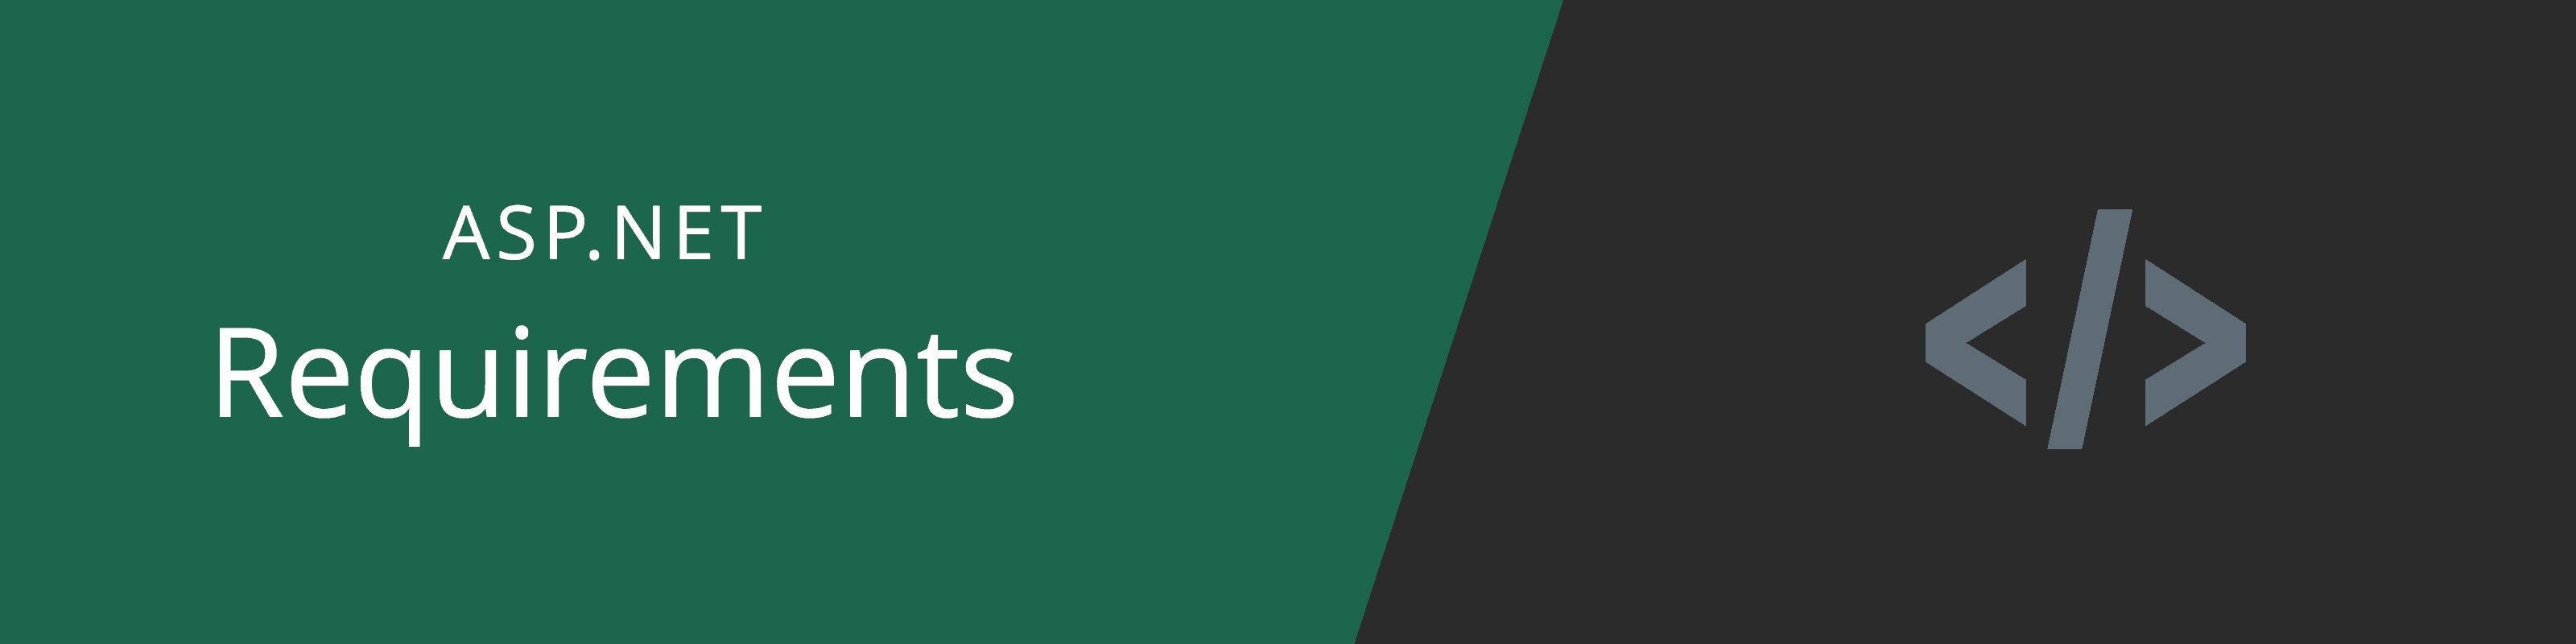 asp-net hosting requirements